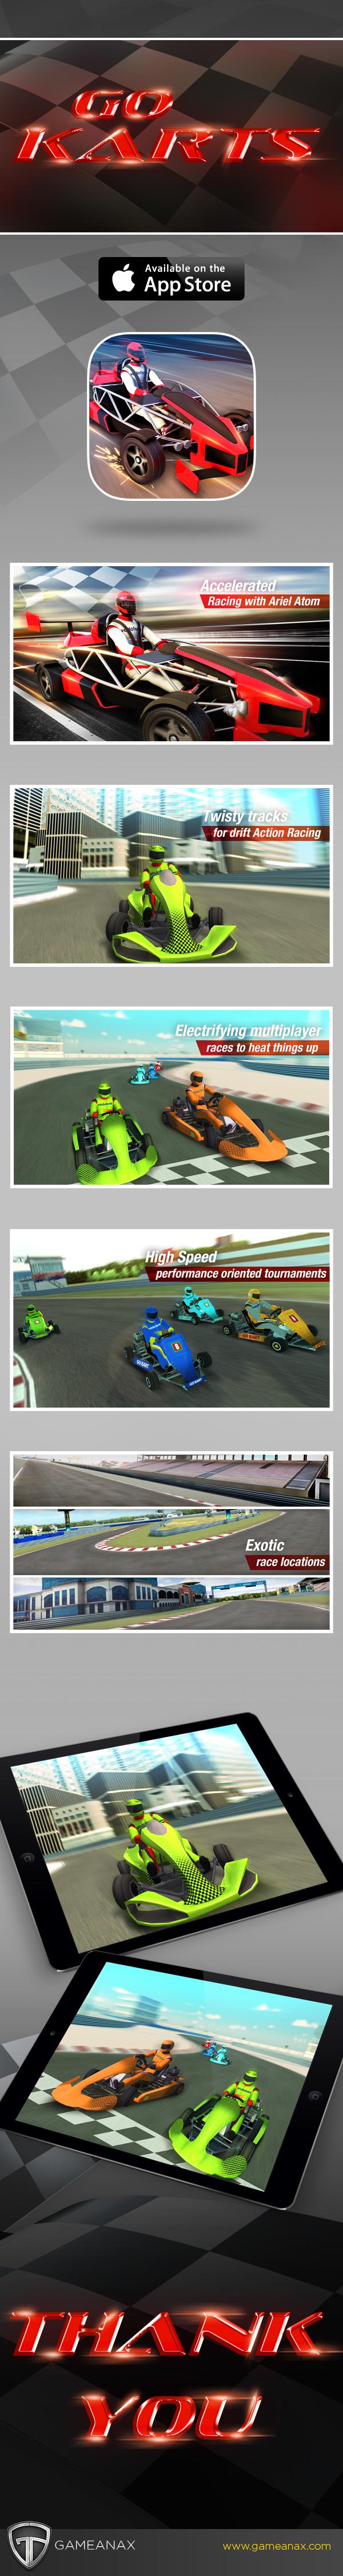 Racing Game go karts UI ux graphics visual fx motion graphic game mobile game mobile gaming Games